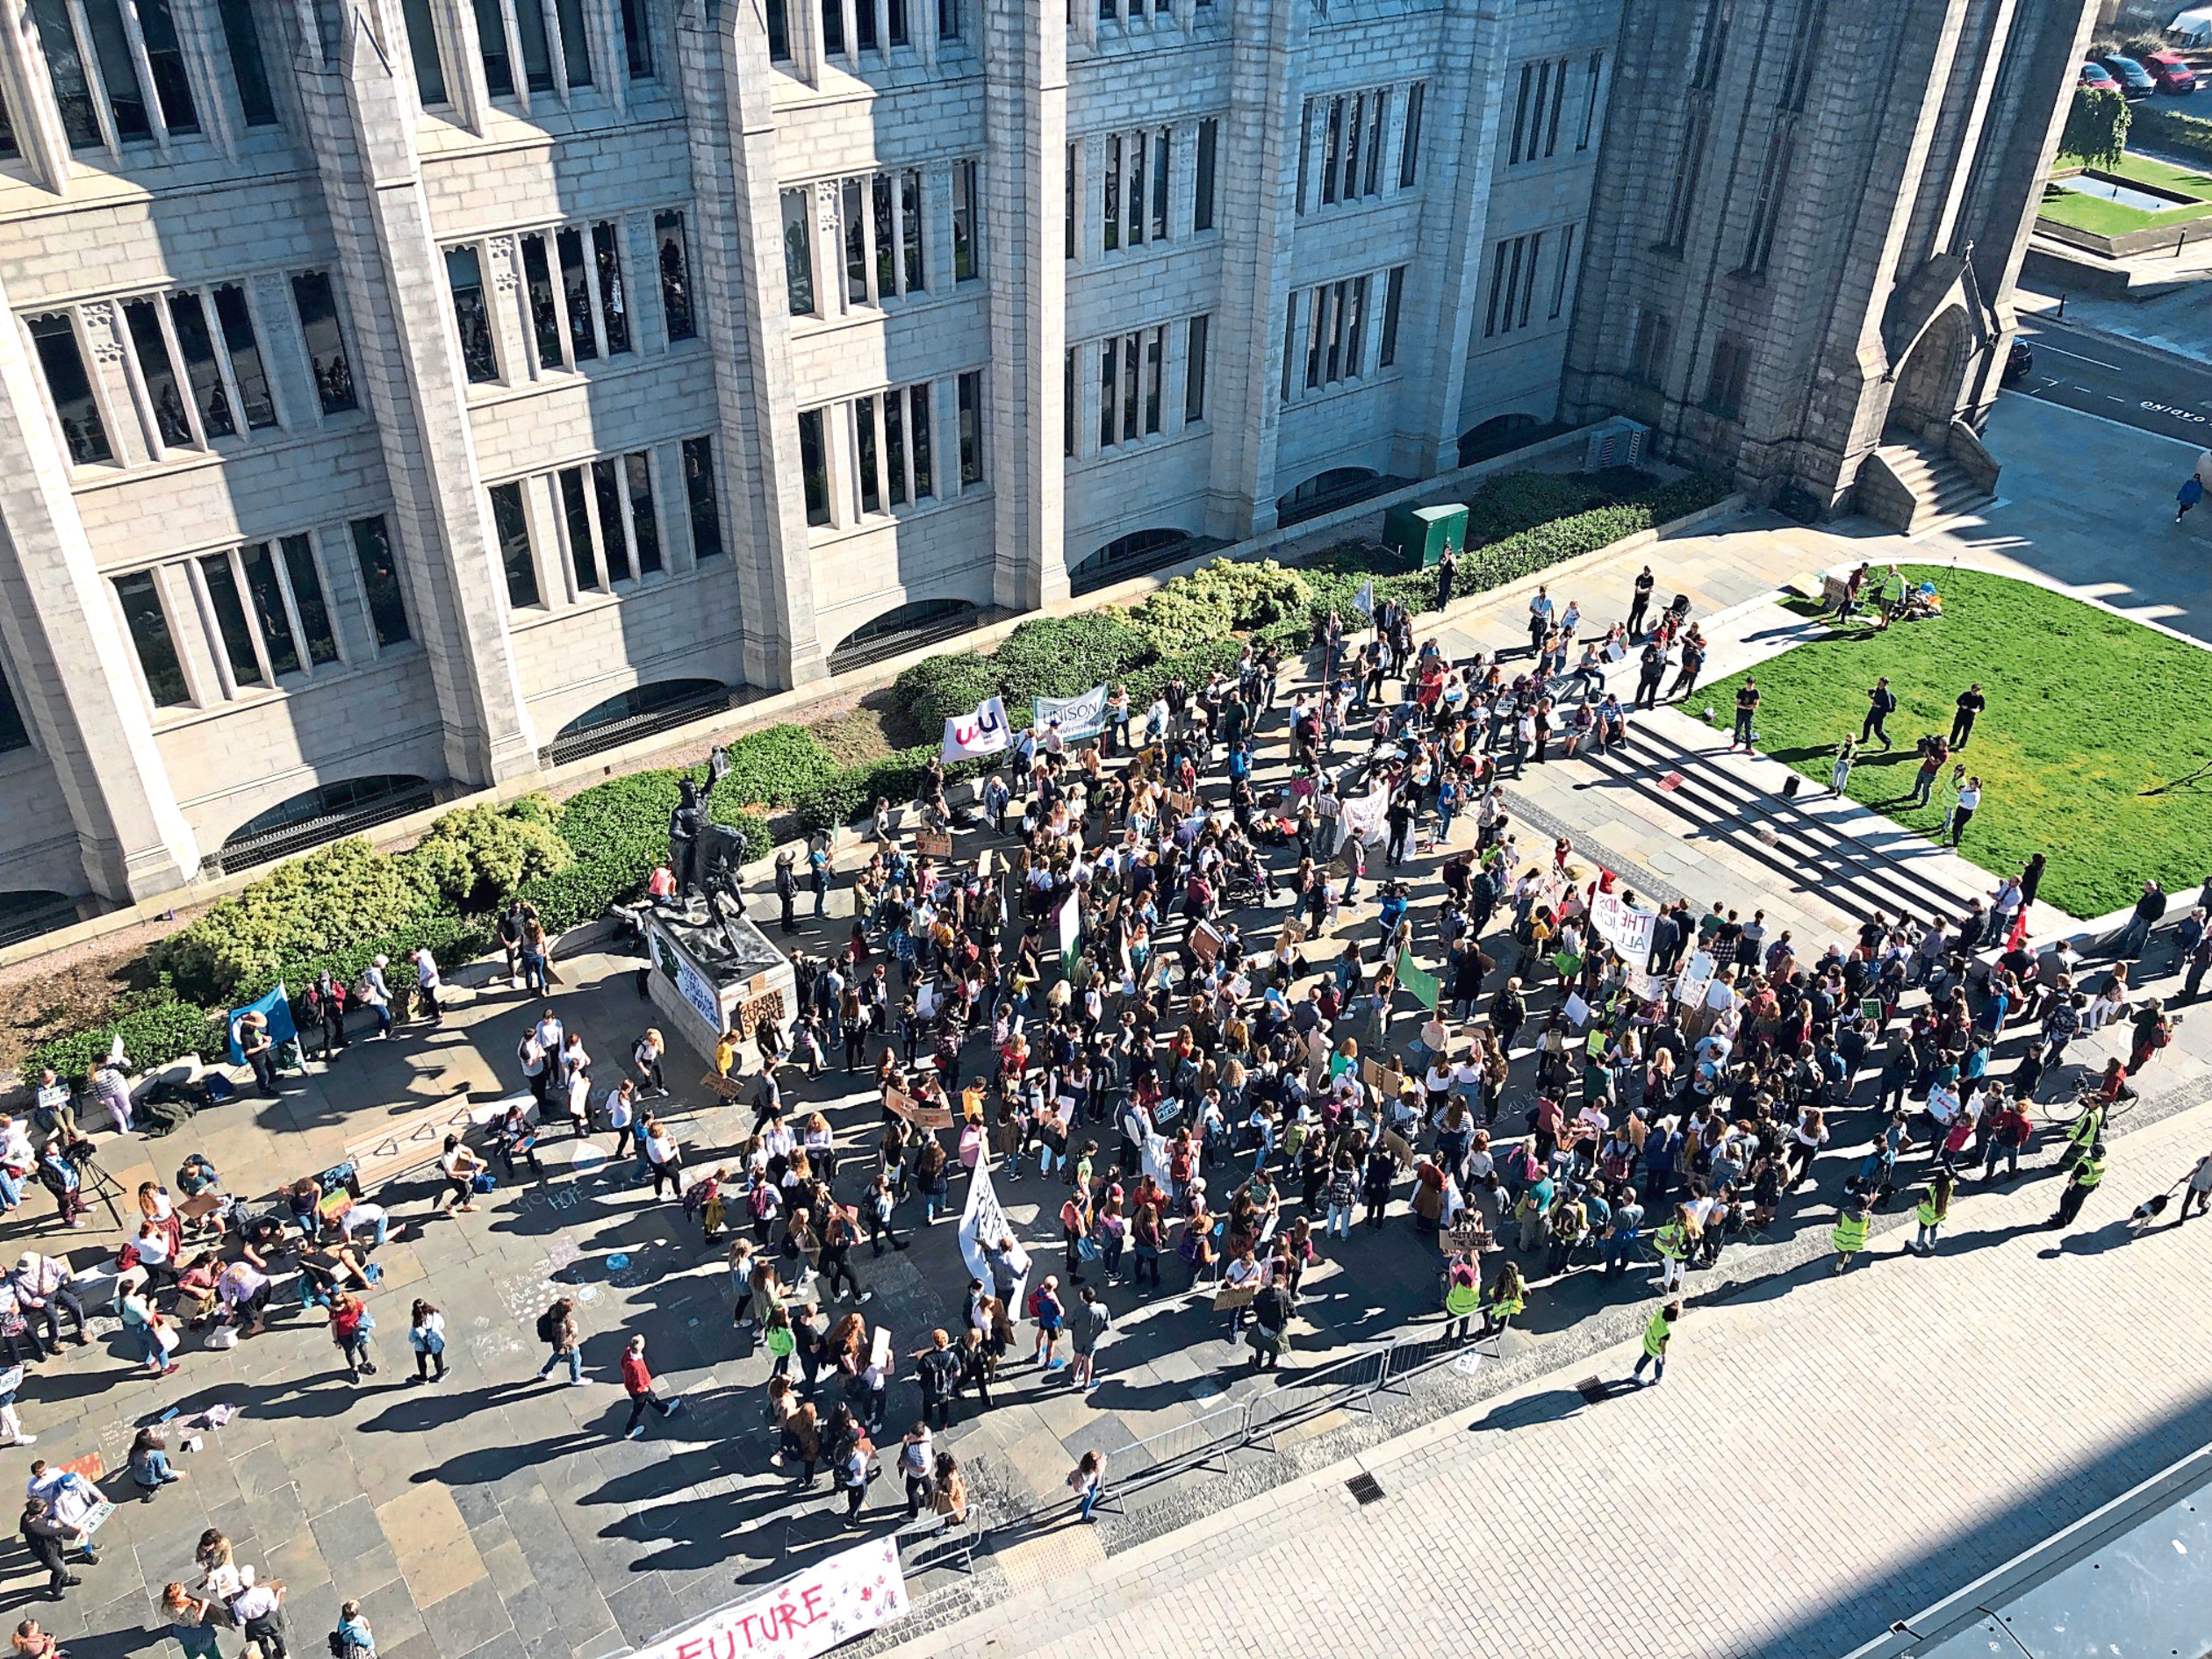 Crowds gathered outside Marischal College in Aberdeen.